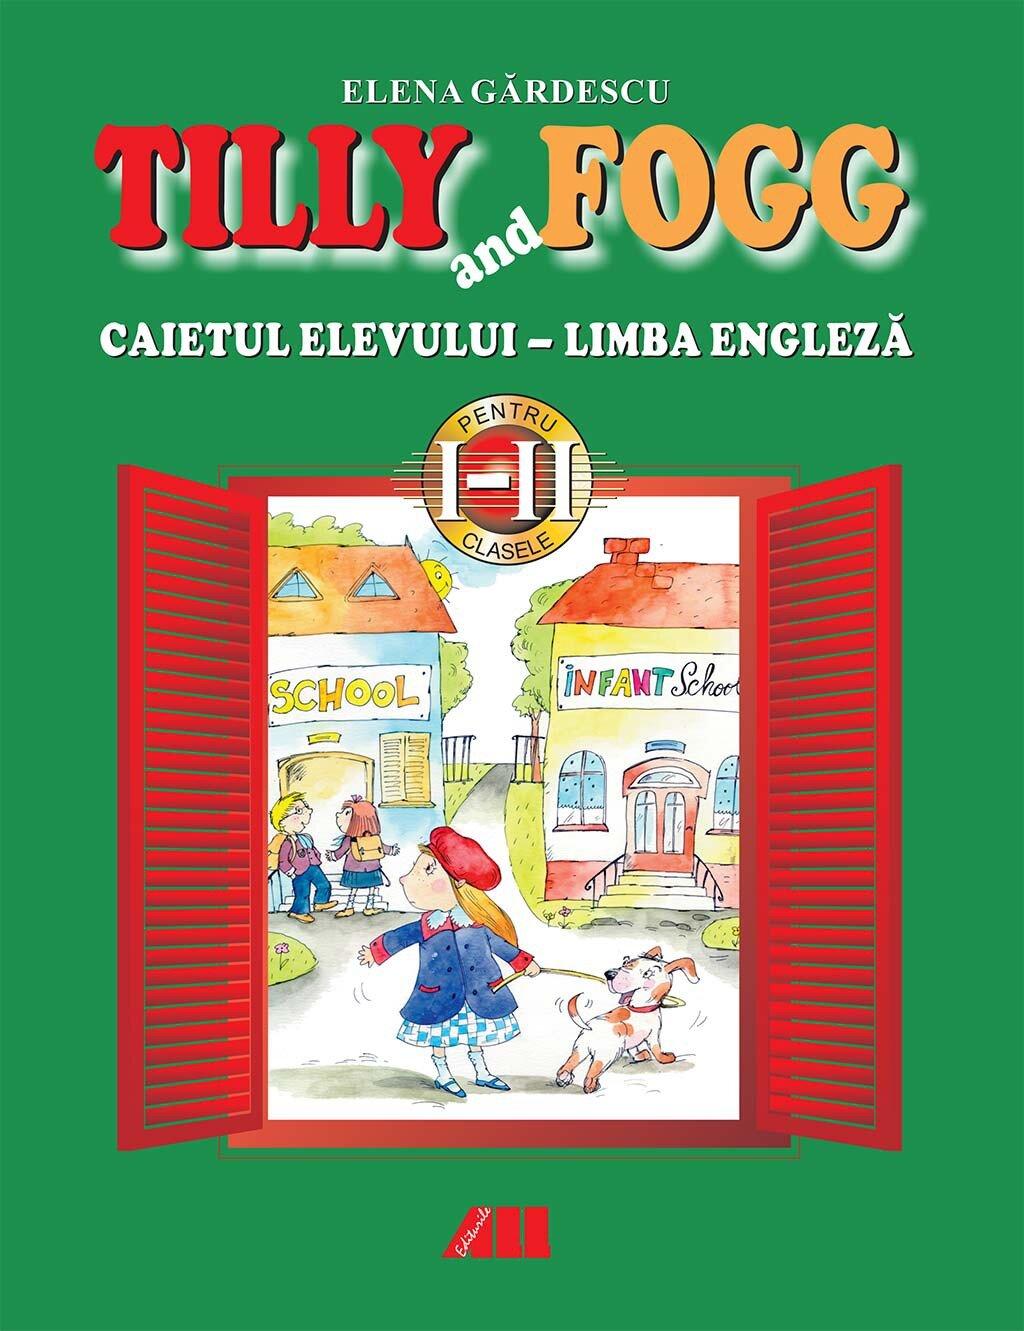 Tilly and Fogg. Caietul elevului - Limba engleza. Clasele I-II PDF (Download eBook)